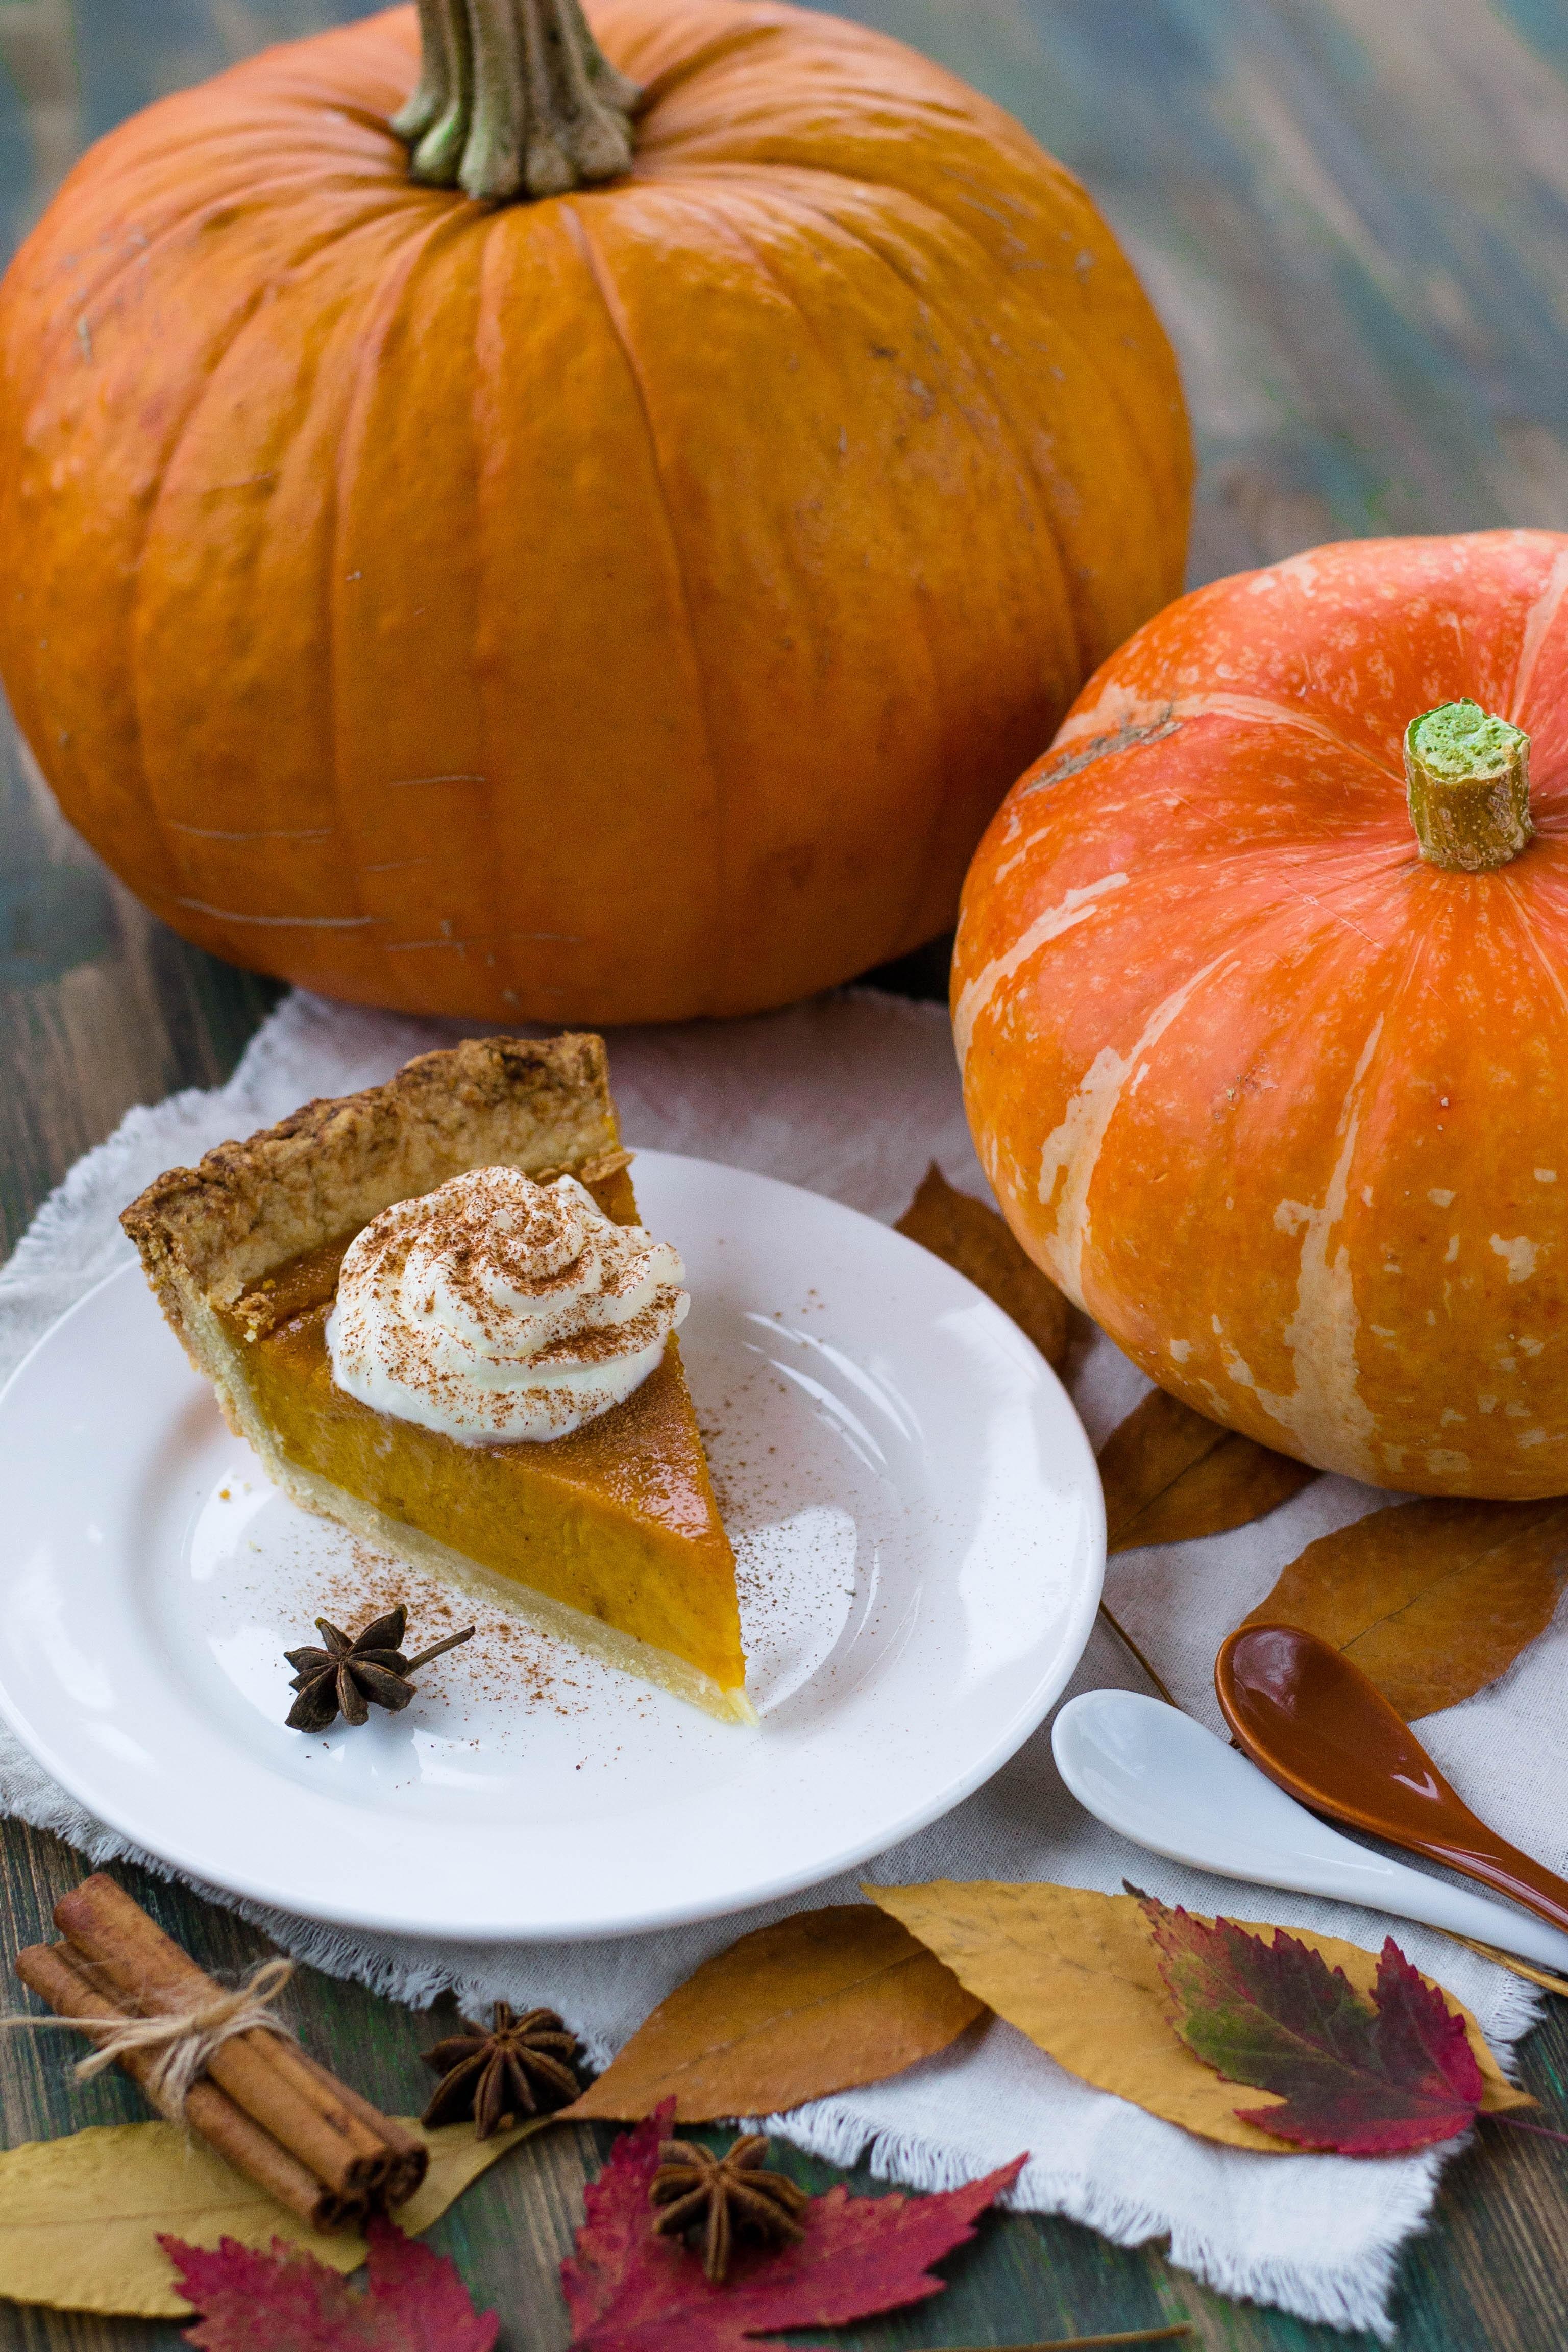 Photo Of Pumpkins 183 Free Stock Photo